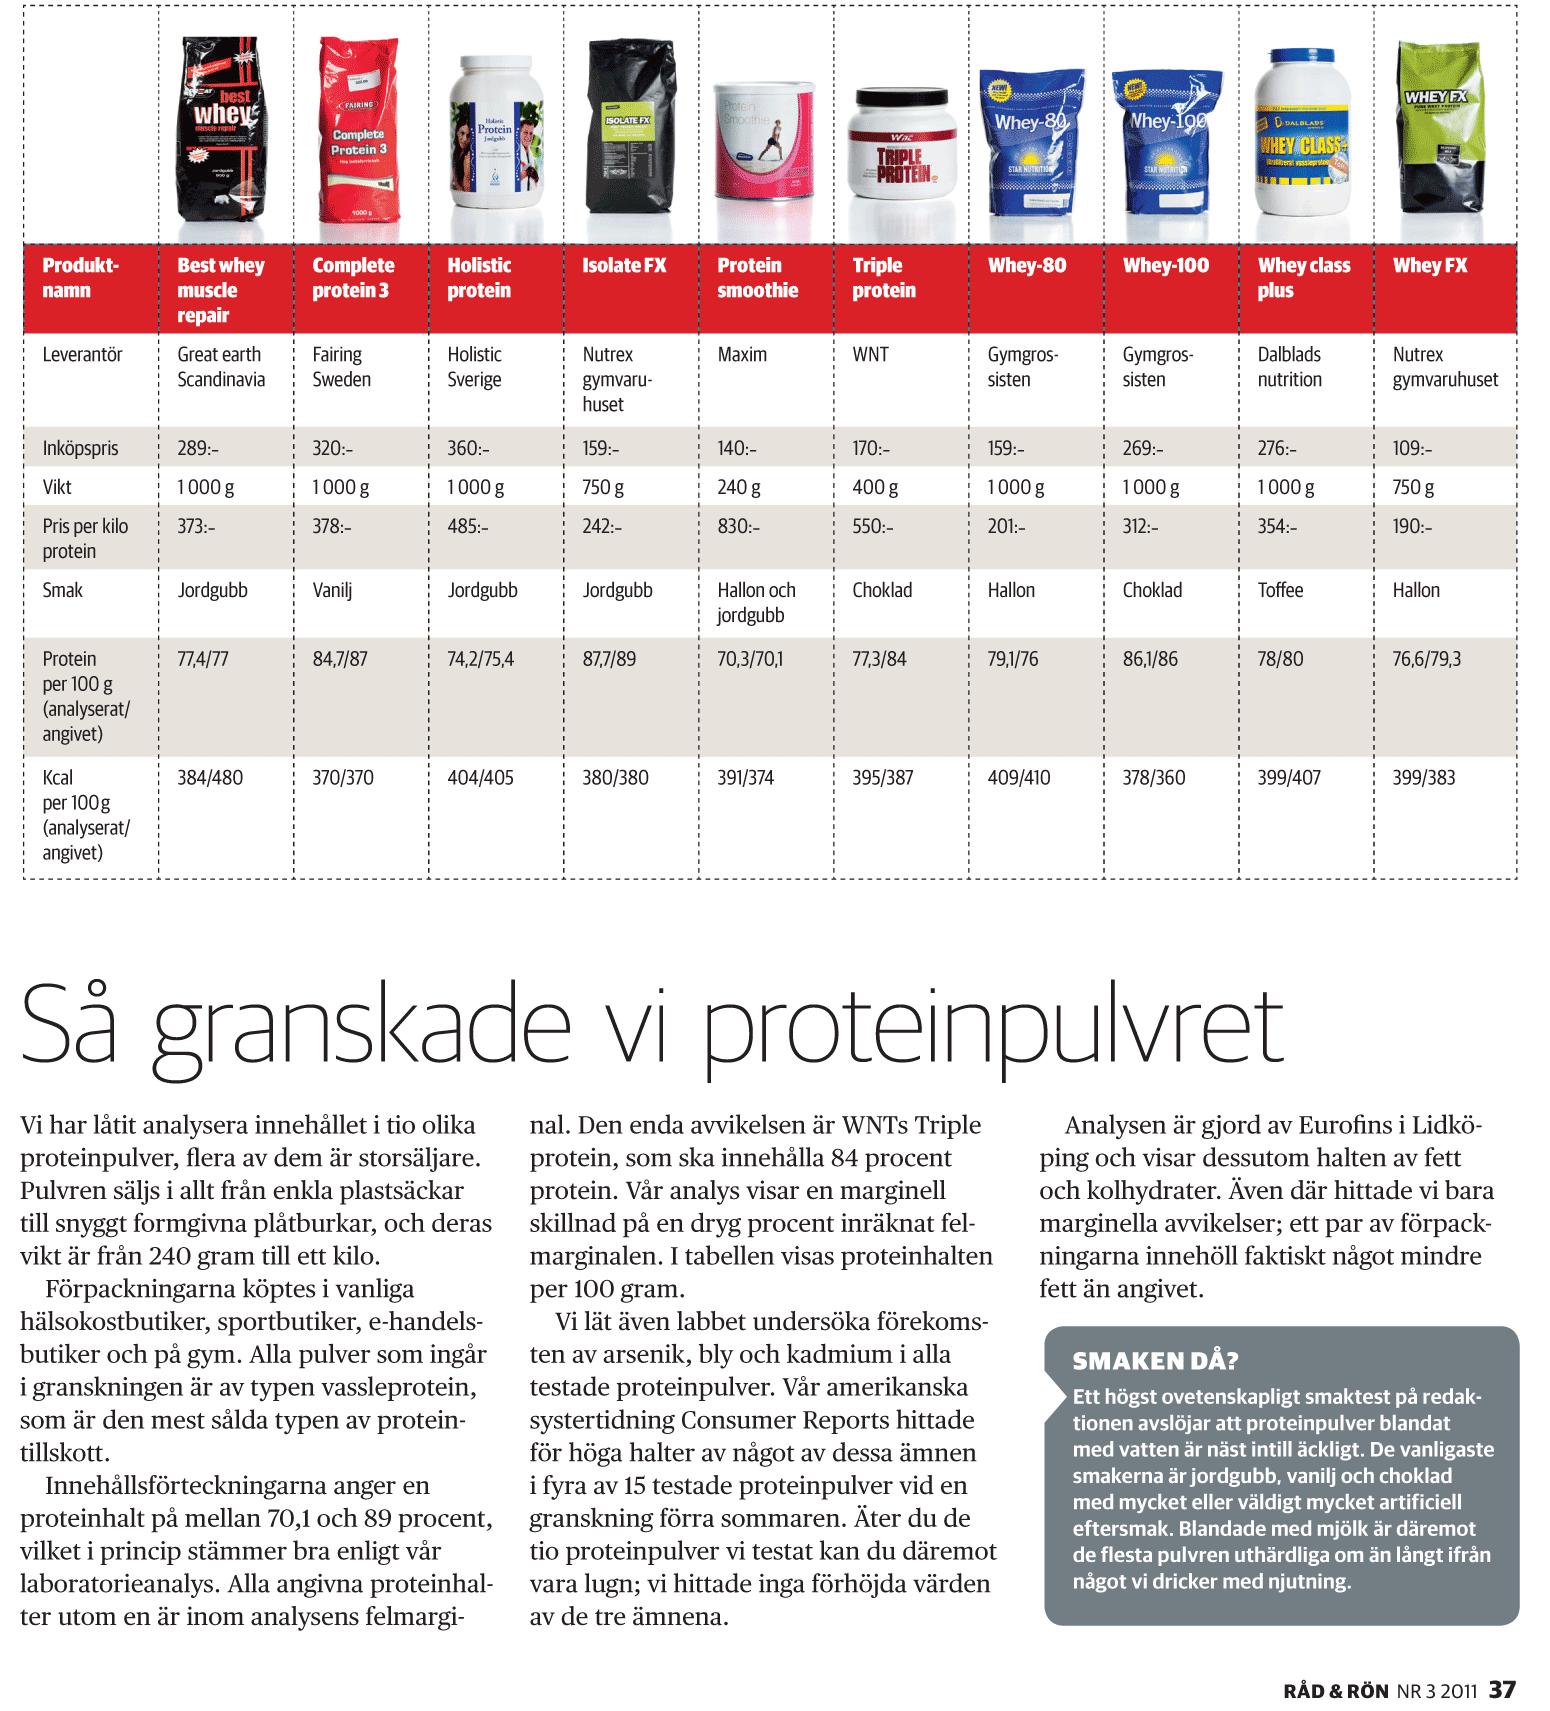 proteinpulver onödigt